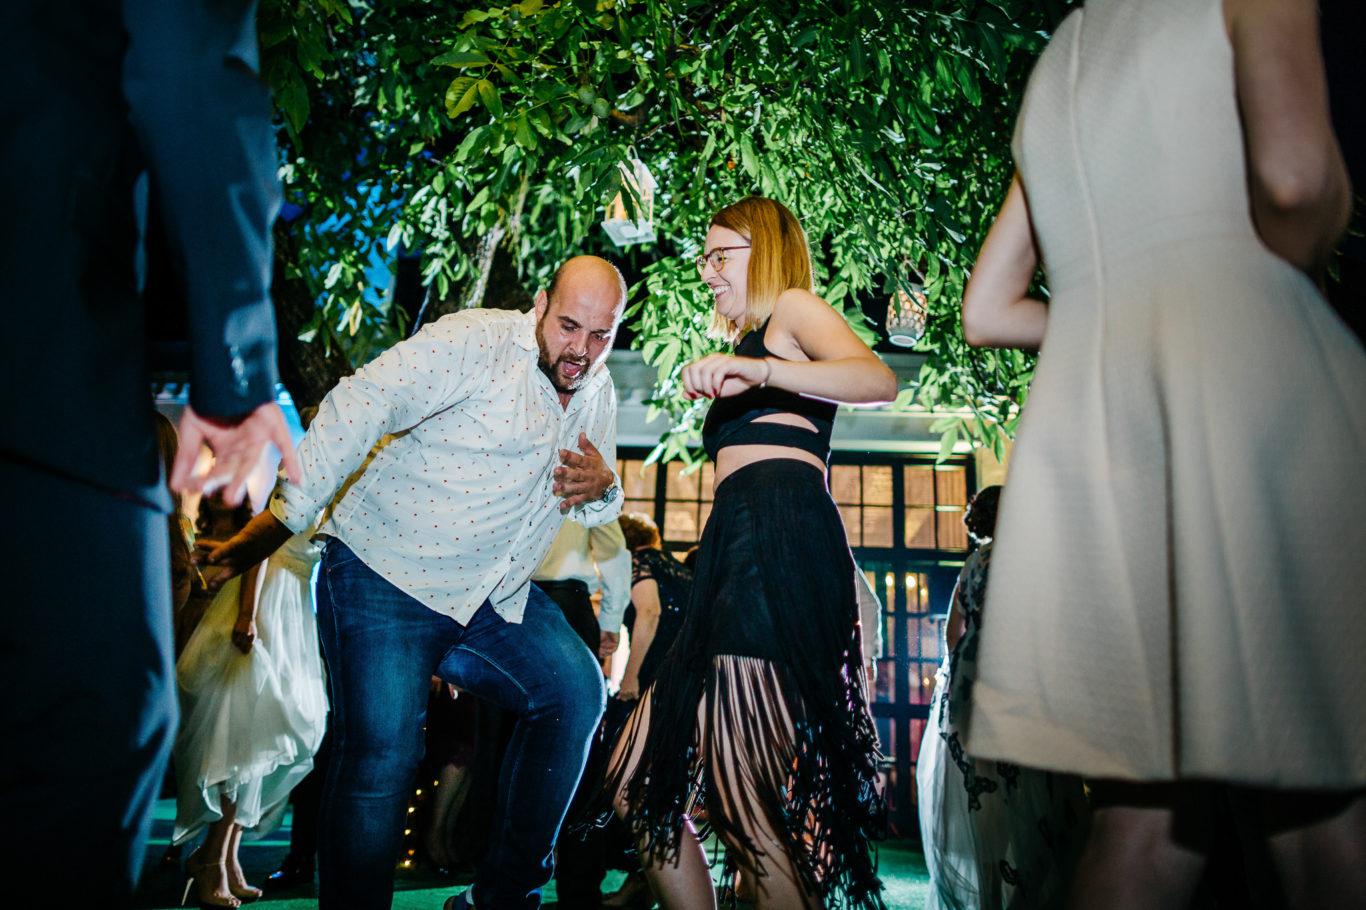 0520-fotoreportaj-nunta-conacul-maldar-cristina-stefan-fotograf-ciprian-dumitrescu-dc1_2725